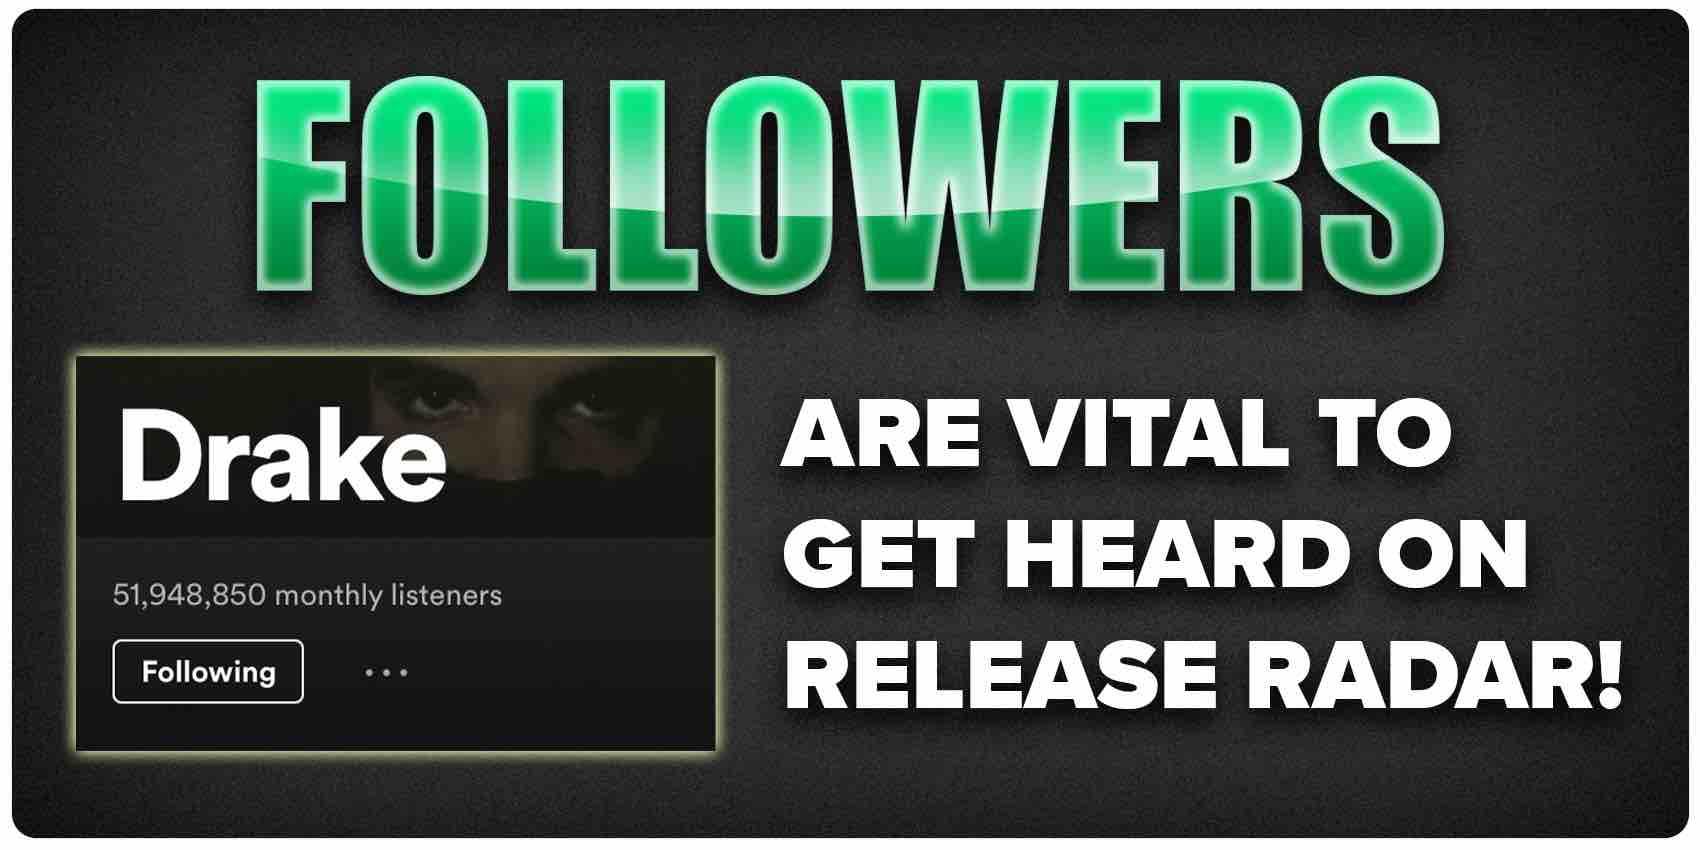 Followers are vital to get heard on Release Radar